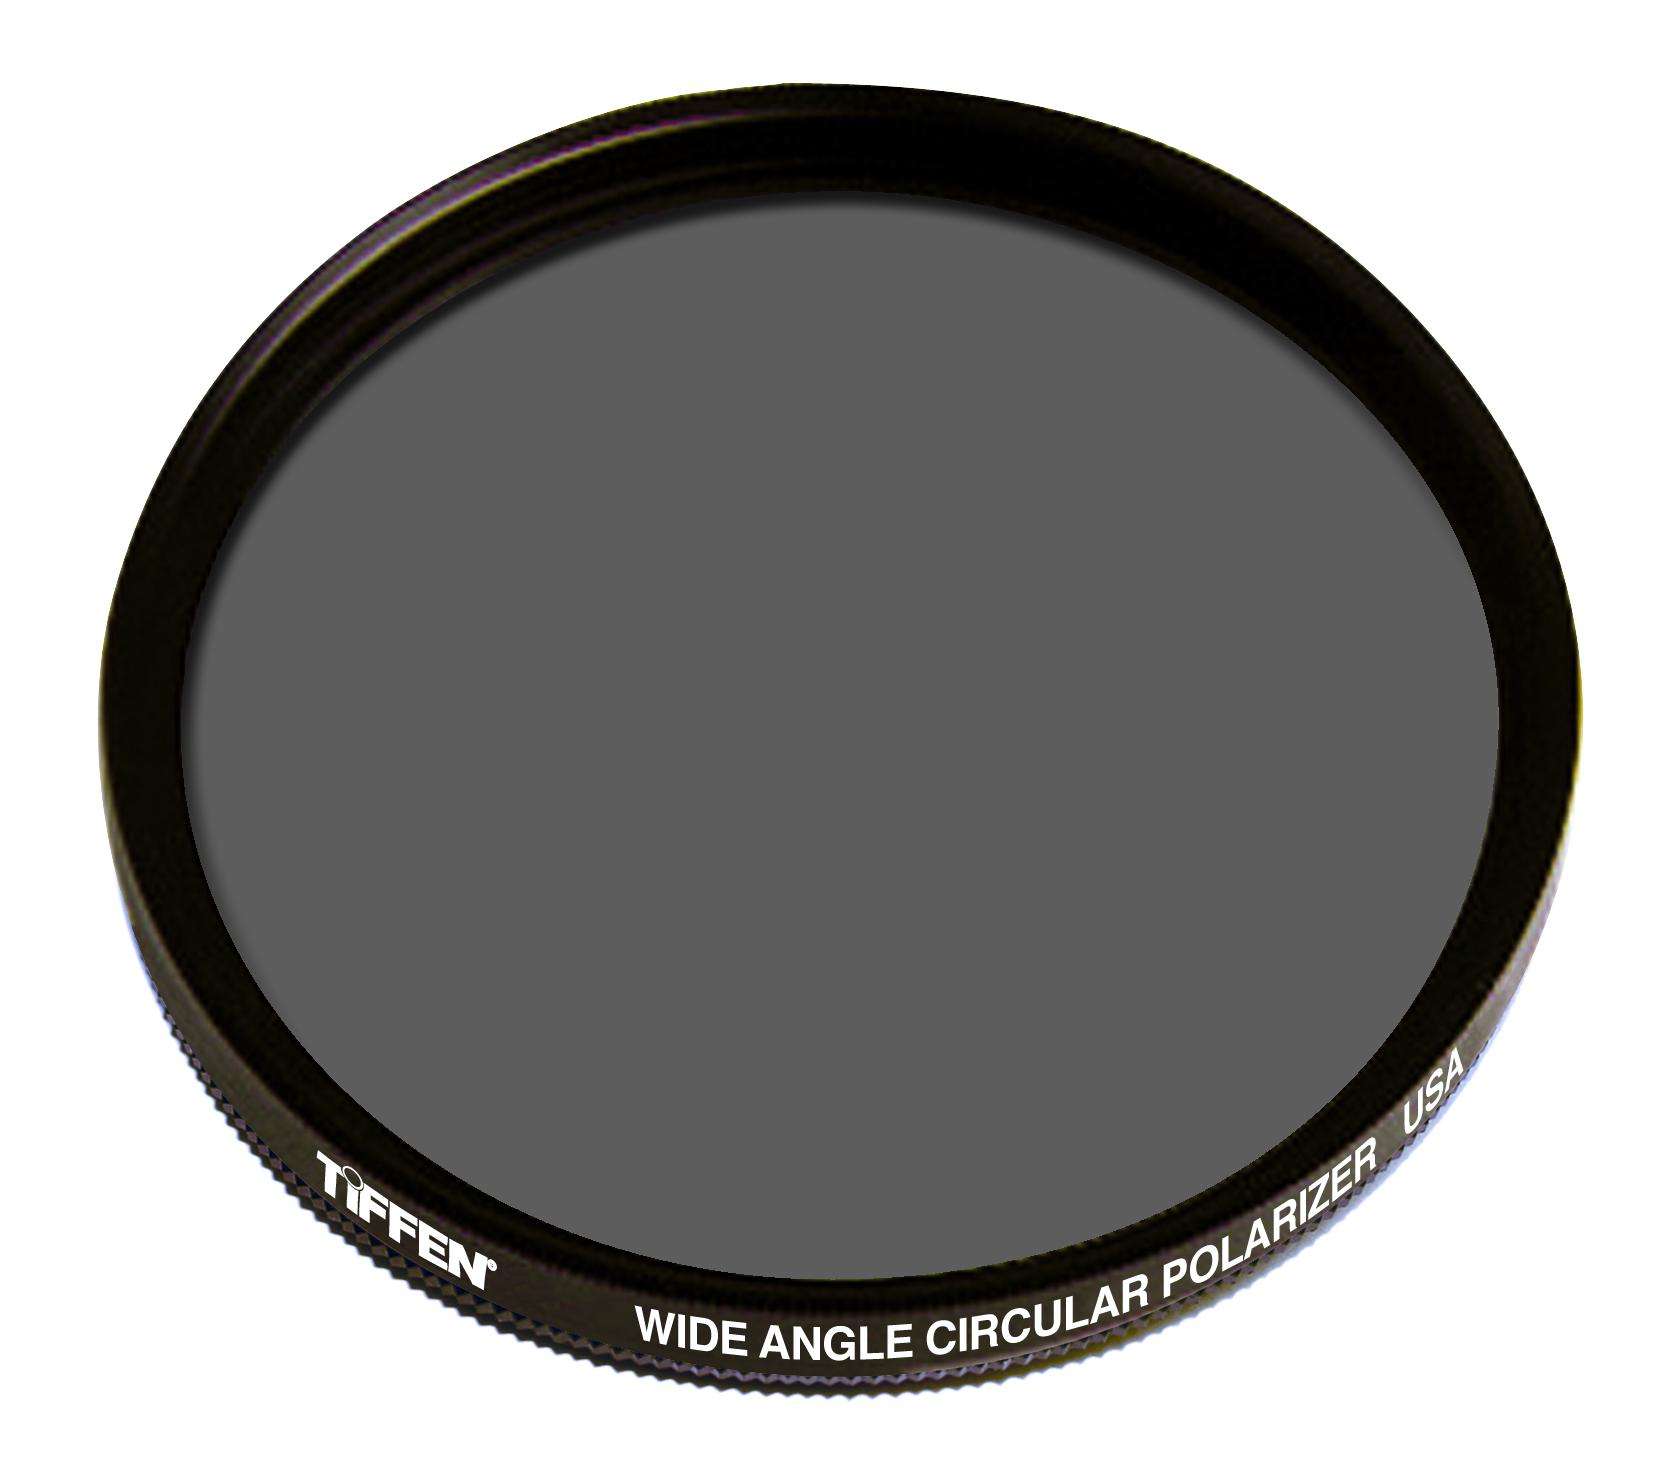 Tiffen 67mm Circulair Polarisatie Wide Angle